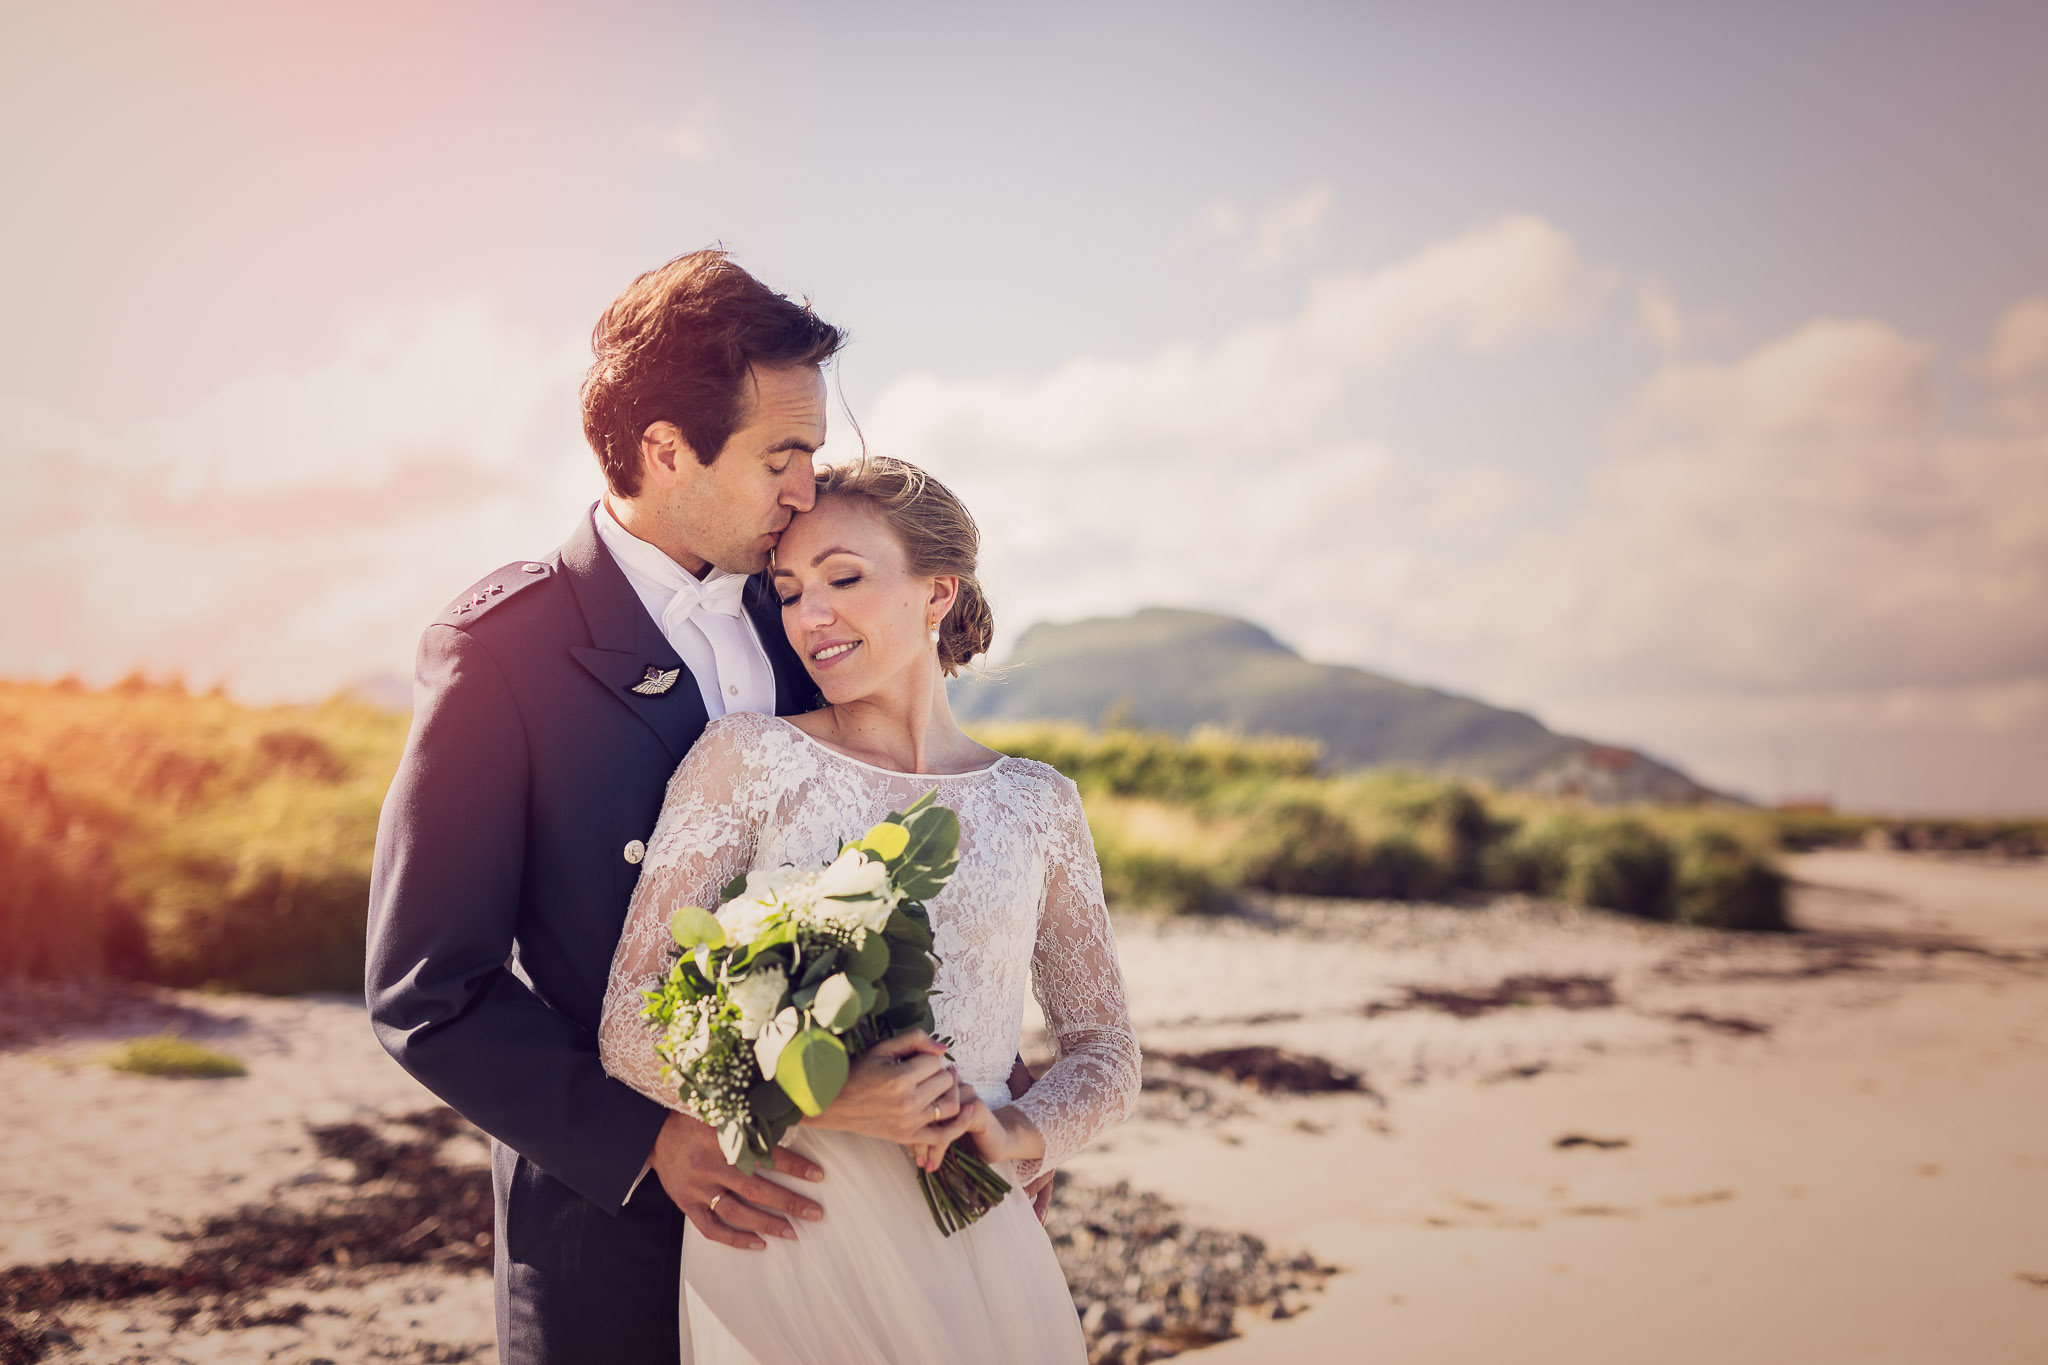 Bryllupsfotografering-lofoten-heldags-fjell-28